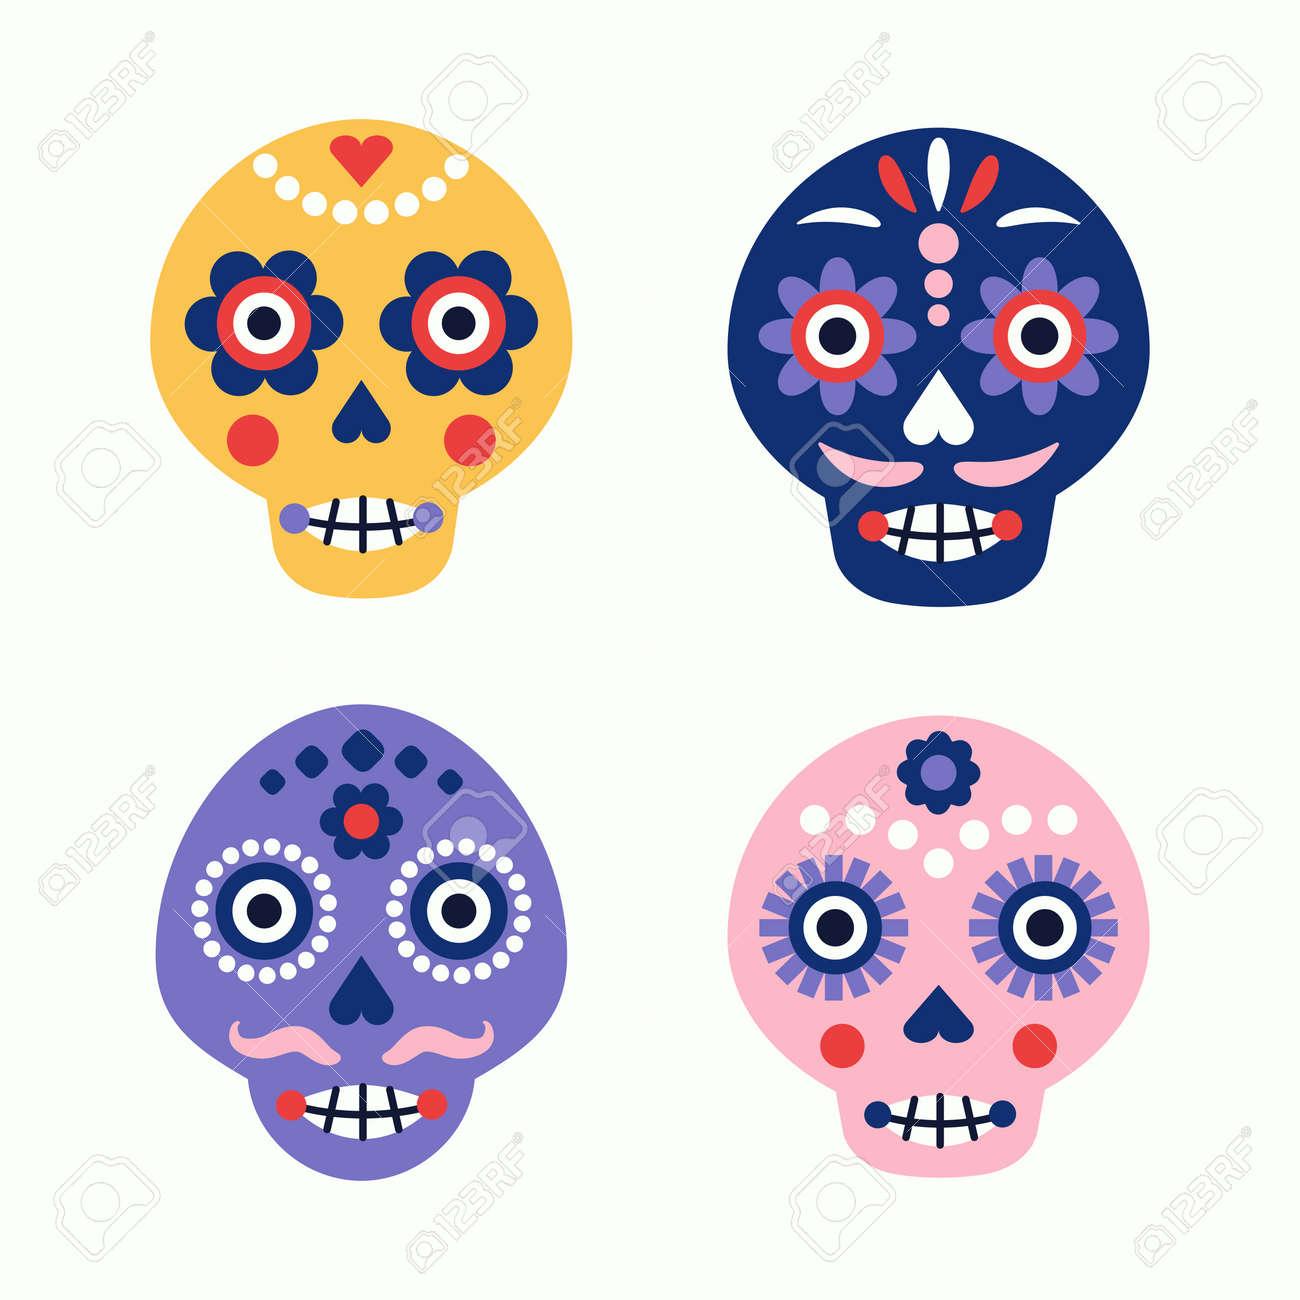 Colorful skull vector set. Day of the dead elements. Dia de los muertos holiday decoration. - 157943690